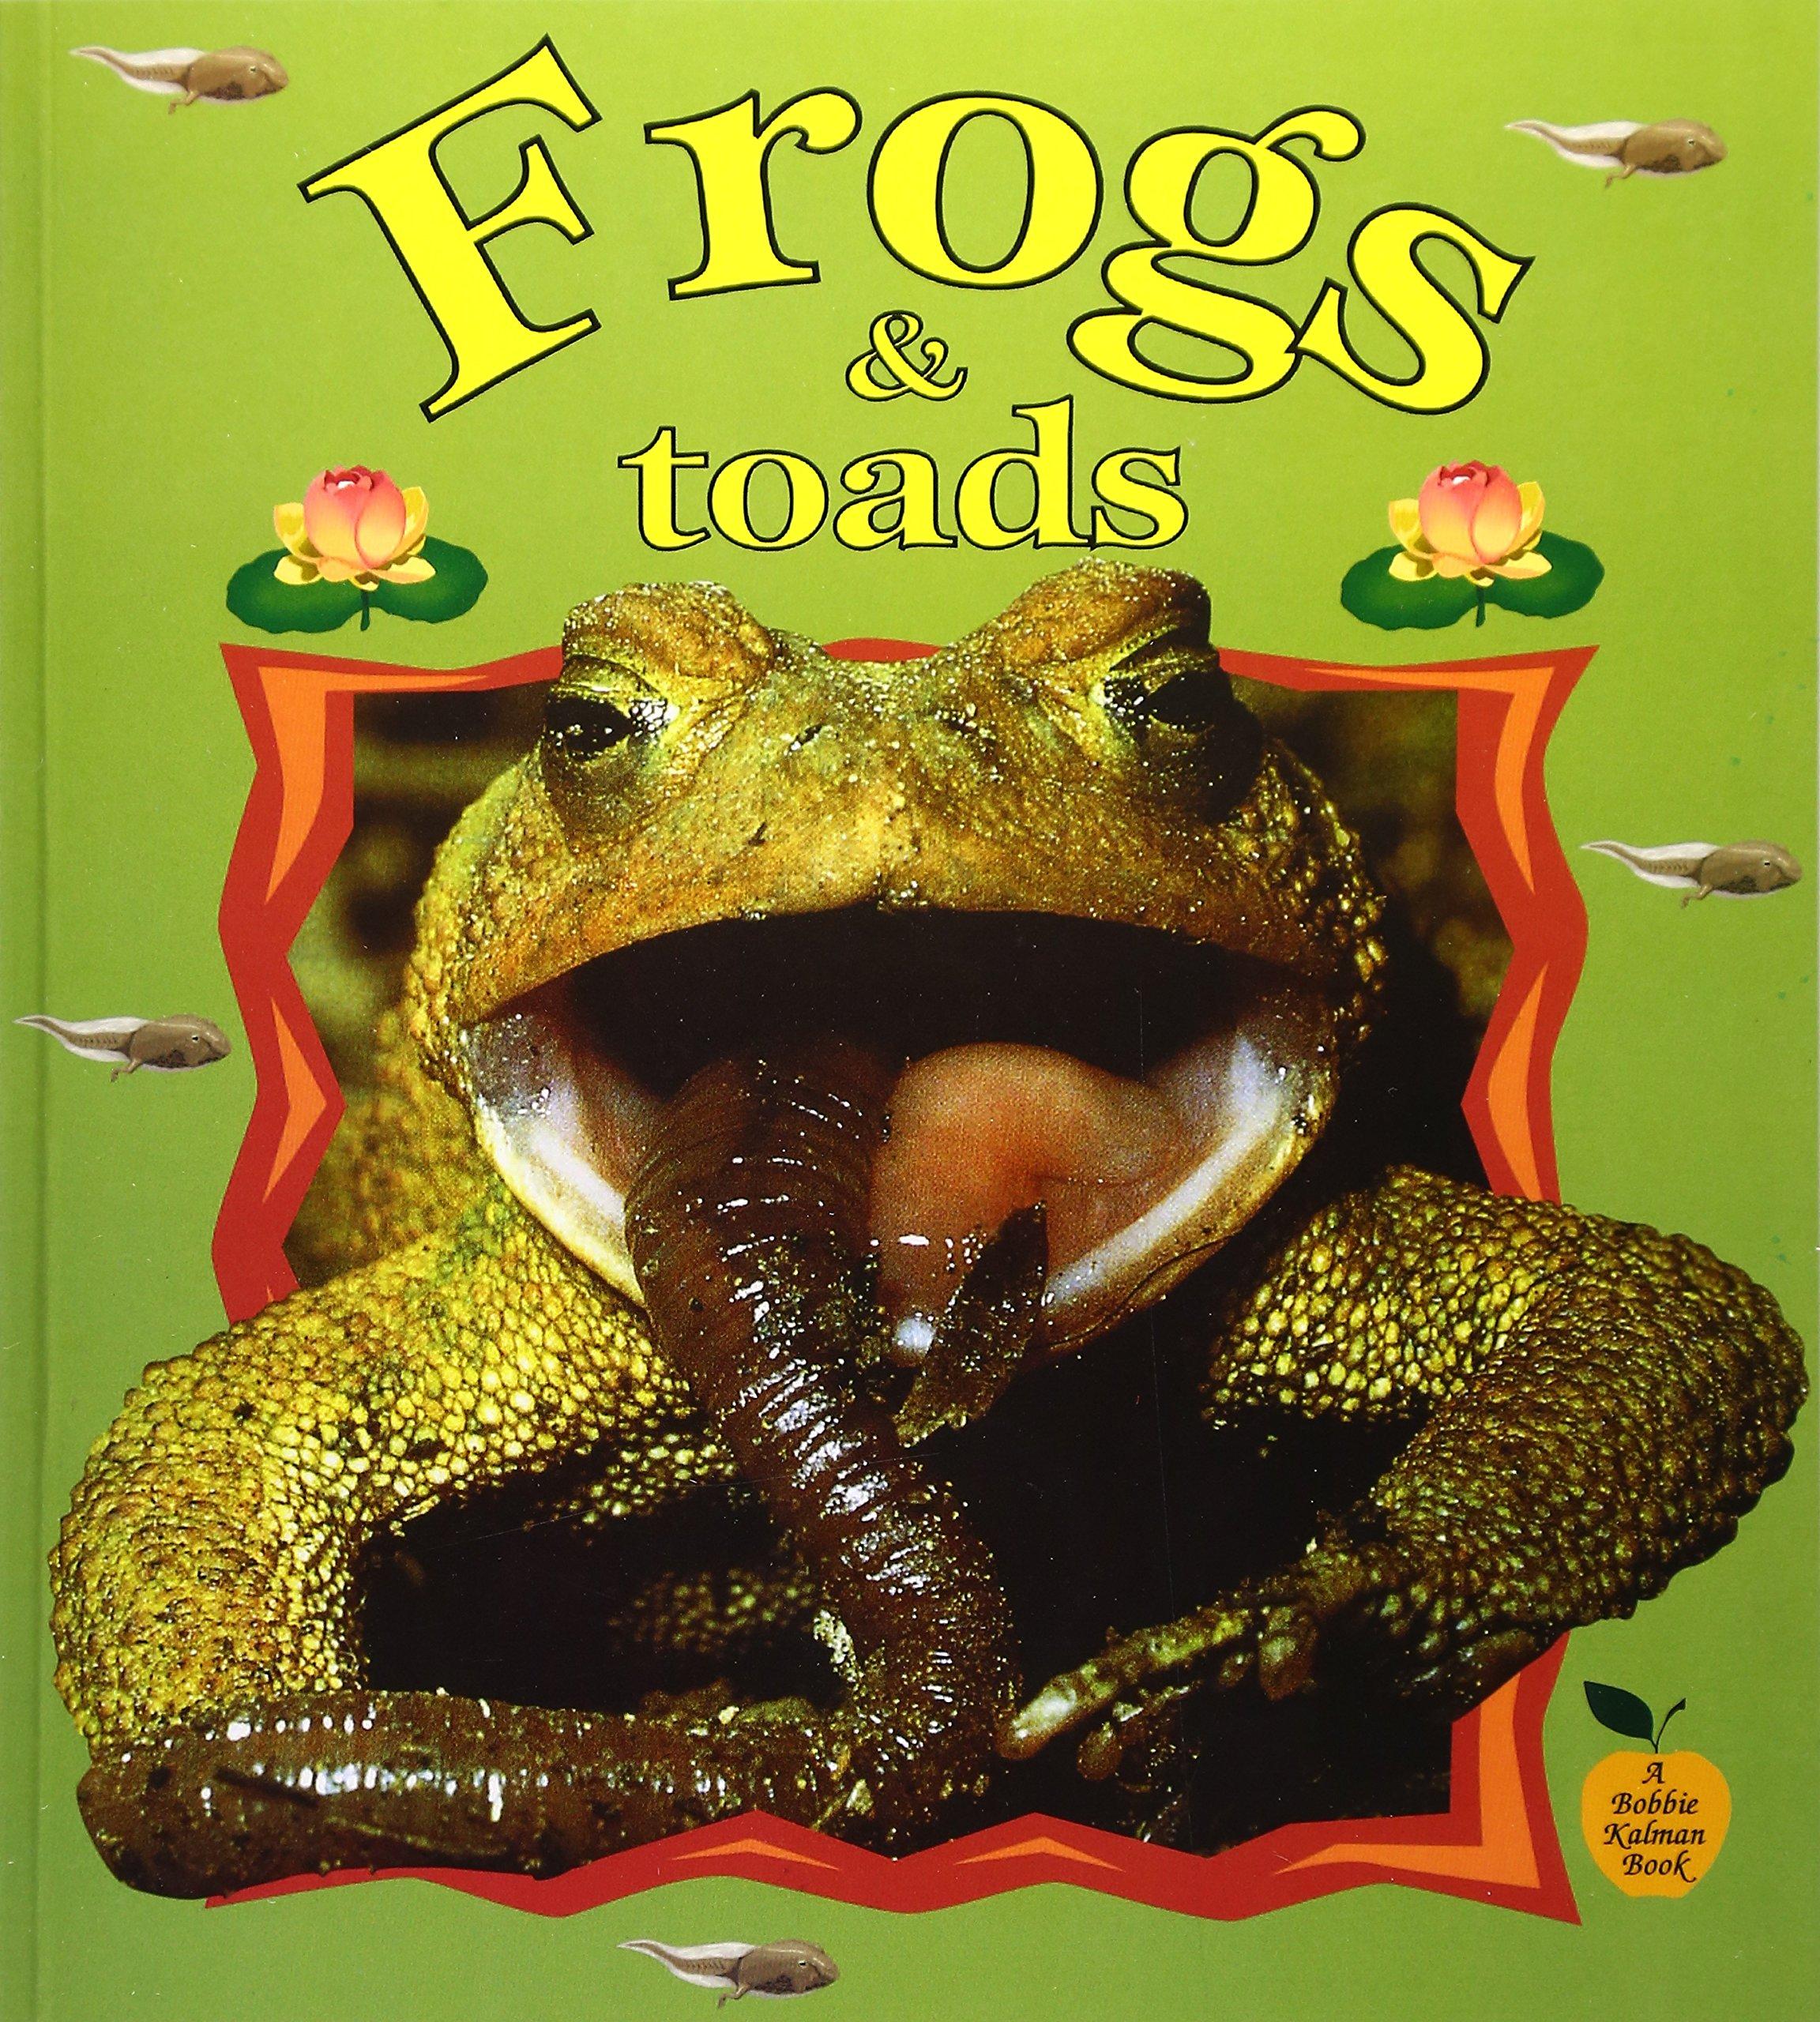 frogs u0026 toads crabapples bobbie everts kalman 9780865057159